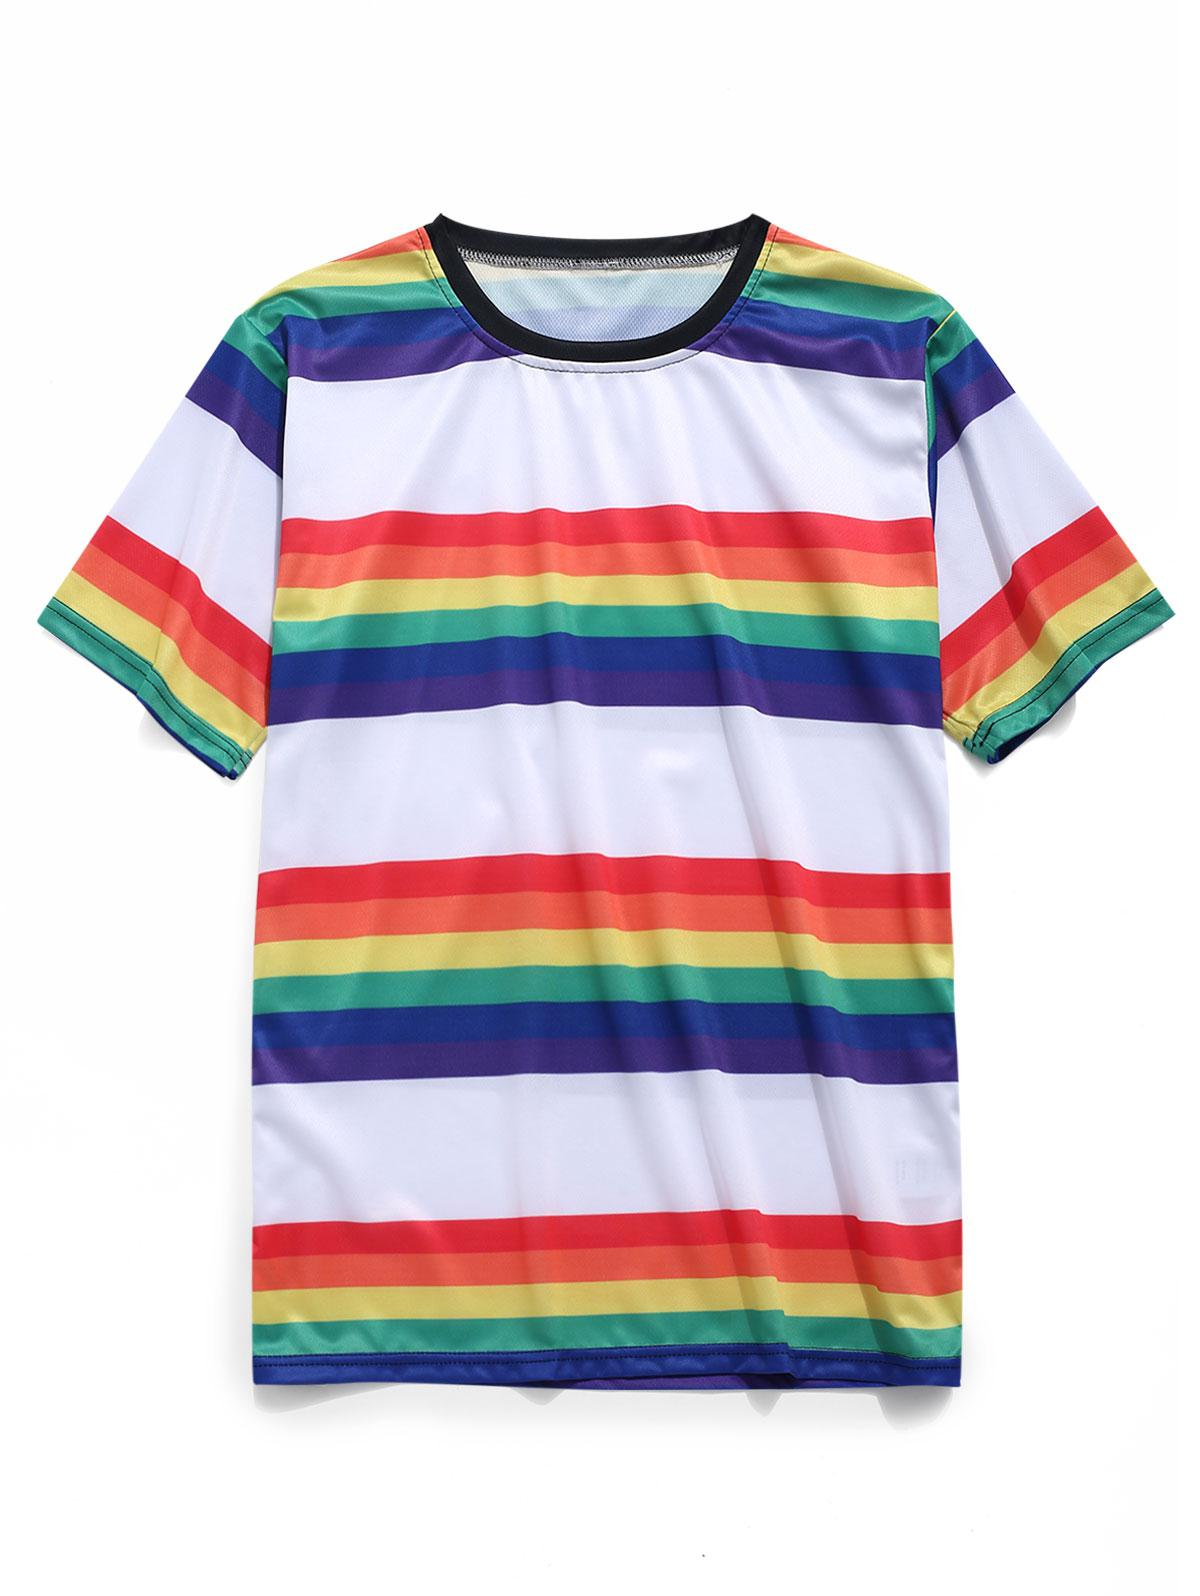 Rainbow Stripes Print Short Sleeves T-shirt, Ruby red